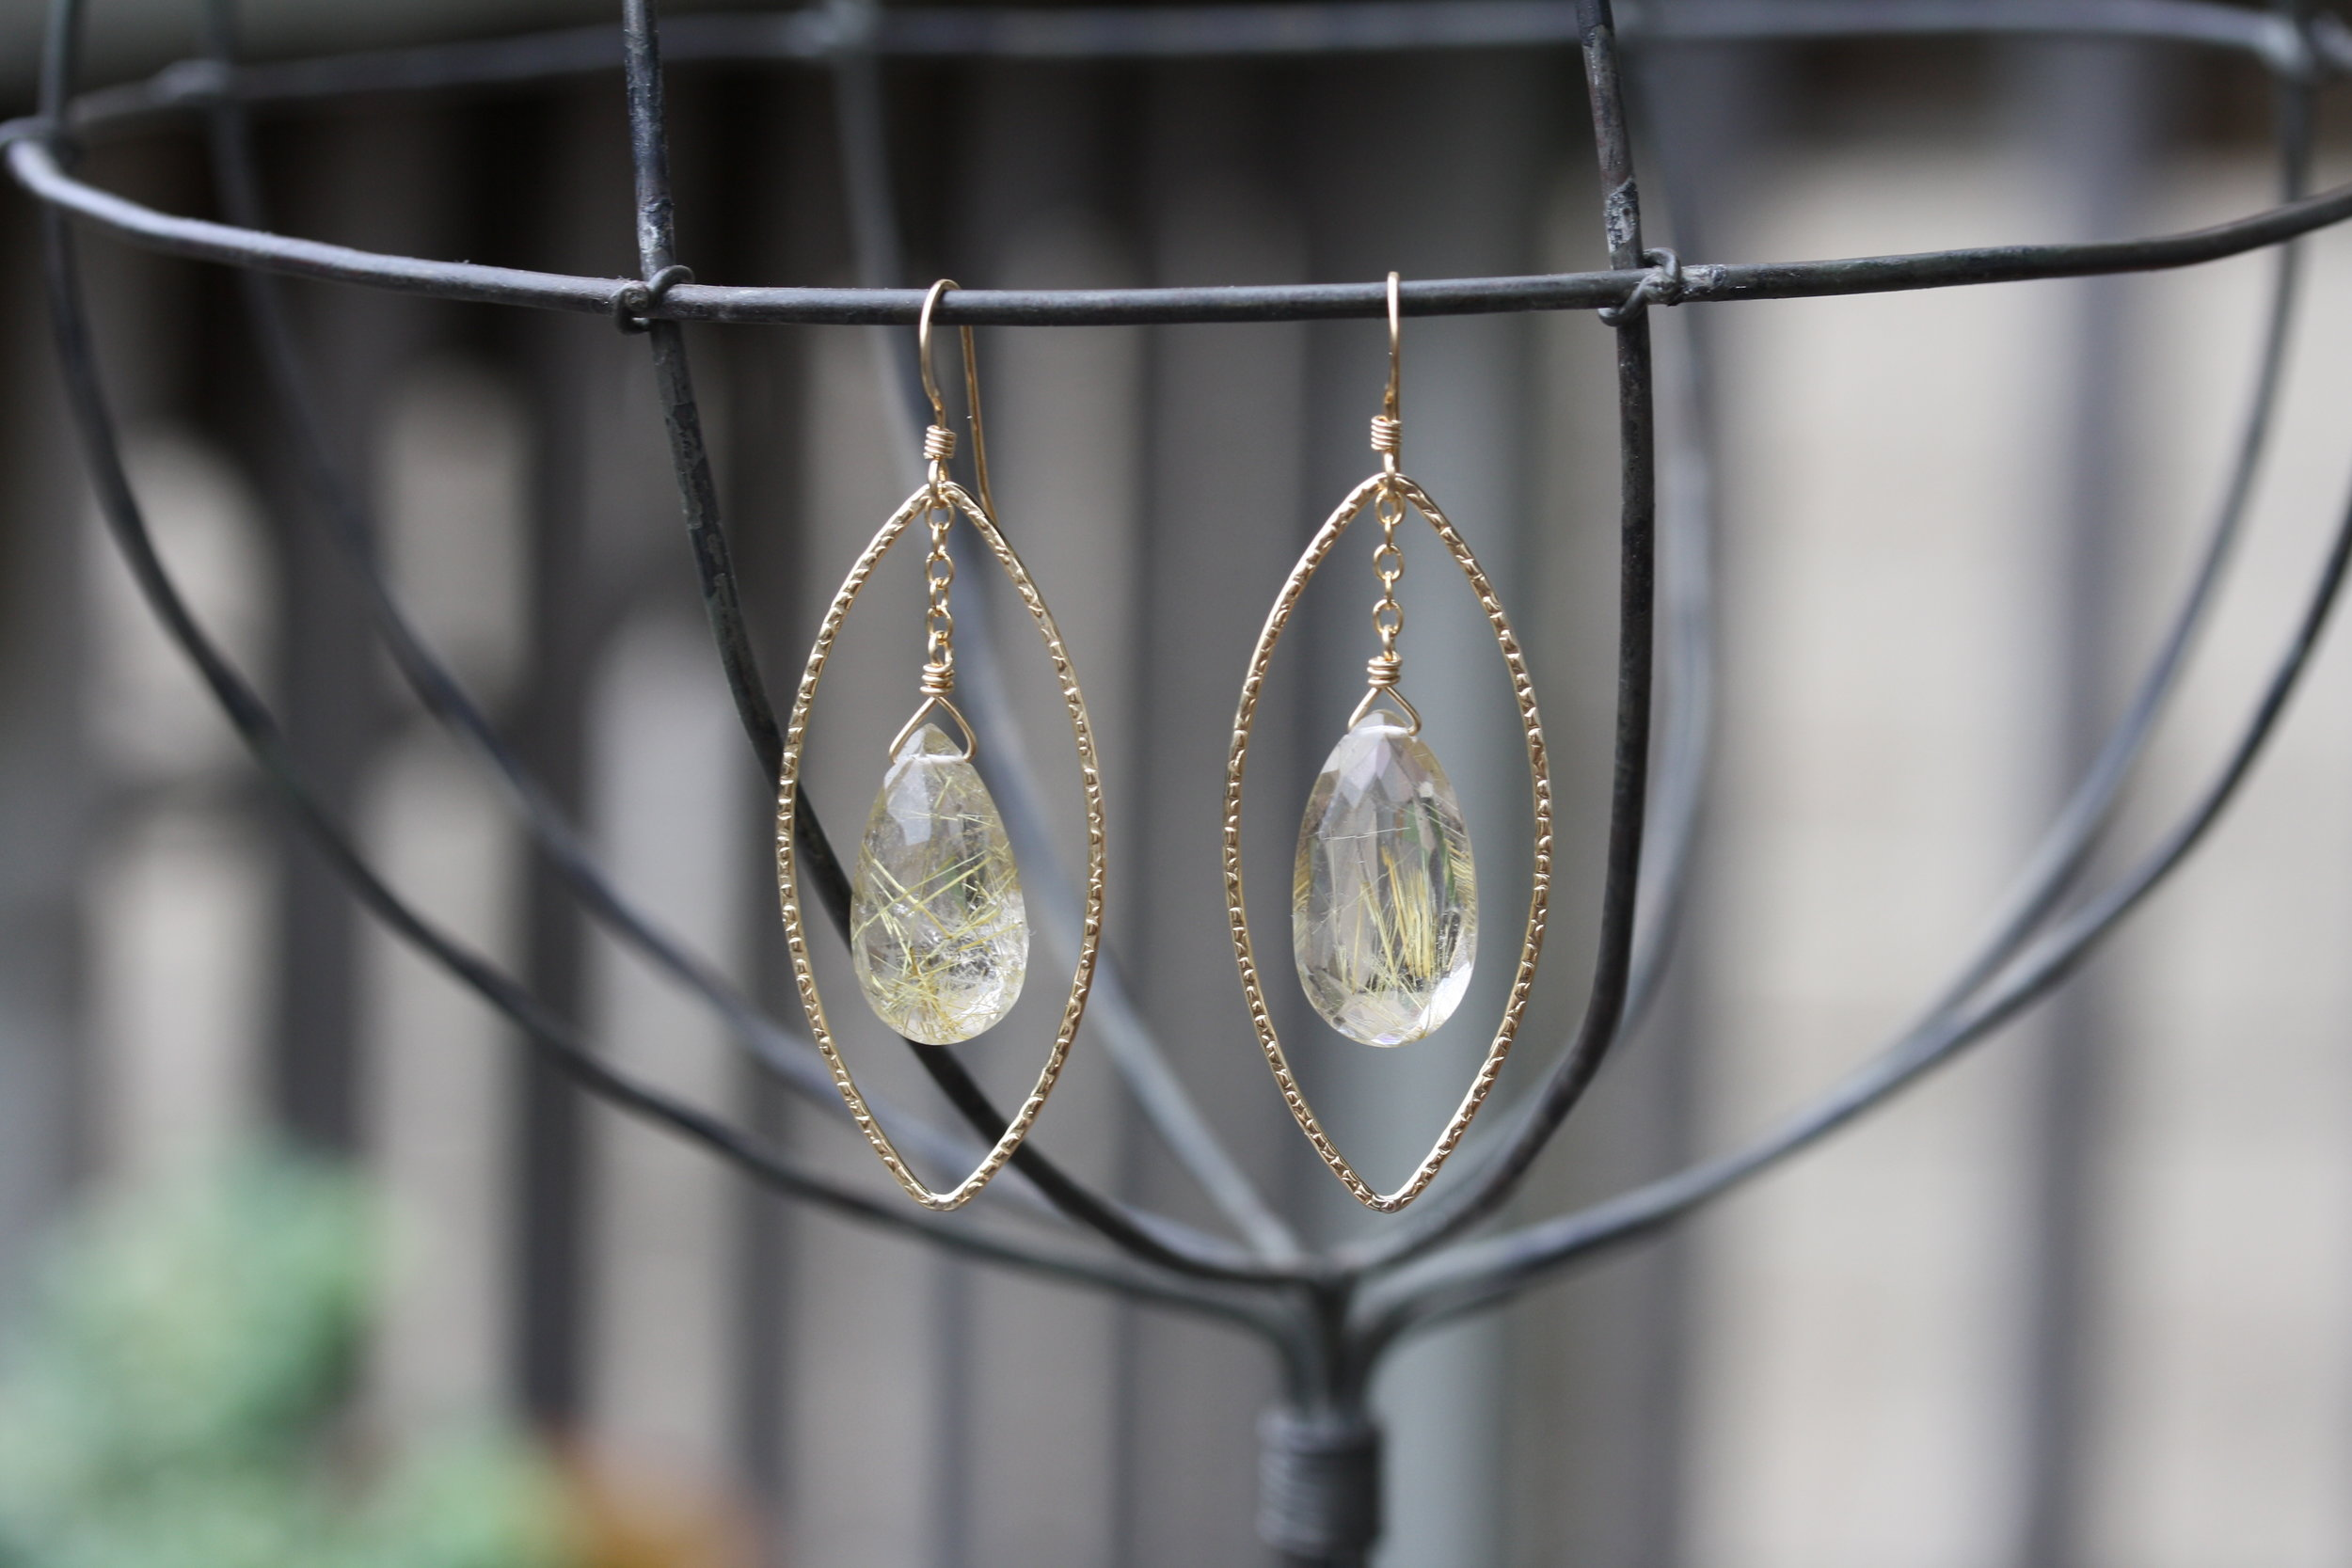 Golden Road Pear Rutilated Quartz Drop in Textured Gold Diamond Shaped Hoop Earrings_05 copy.JPG